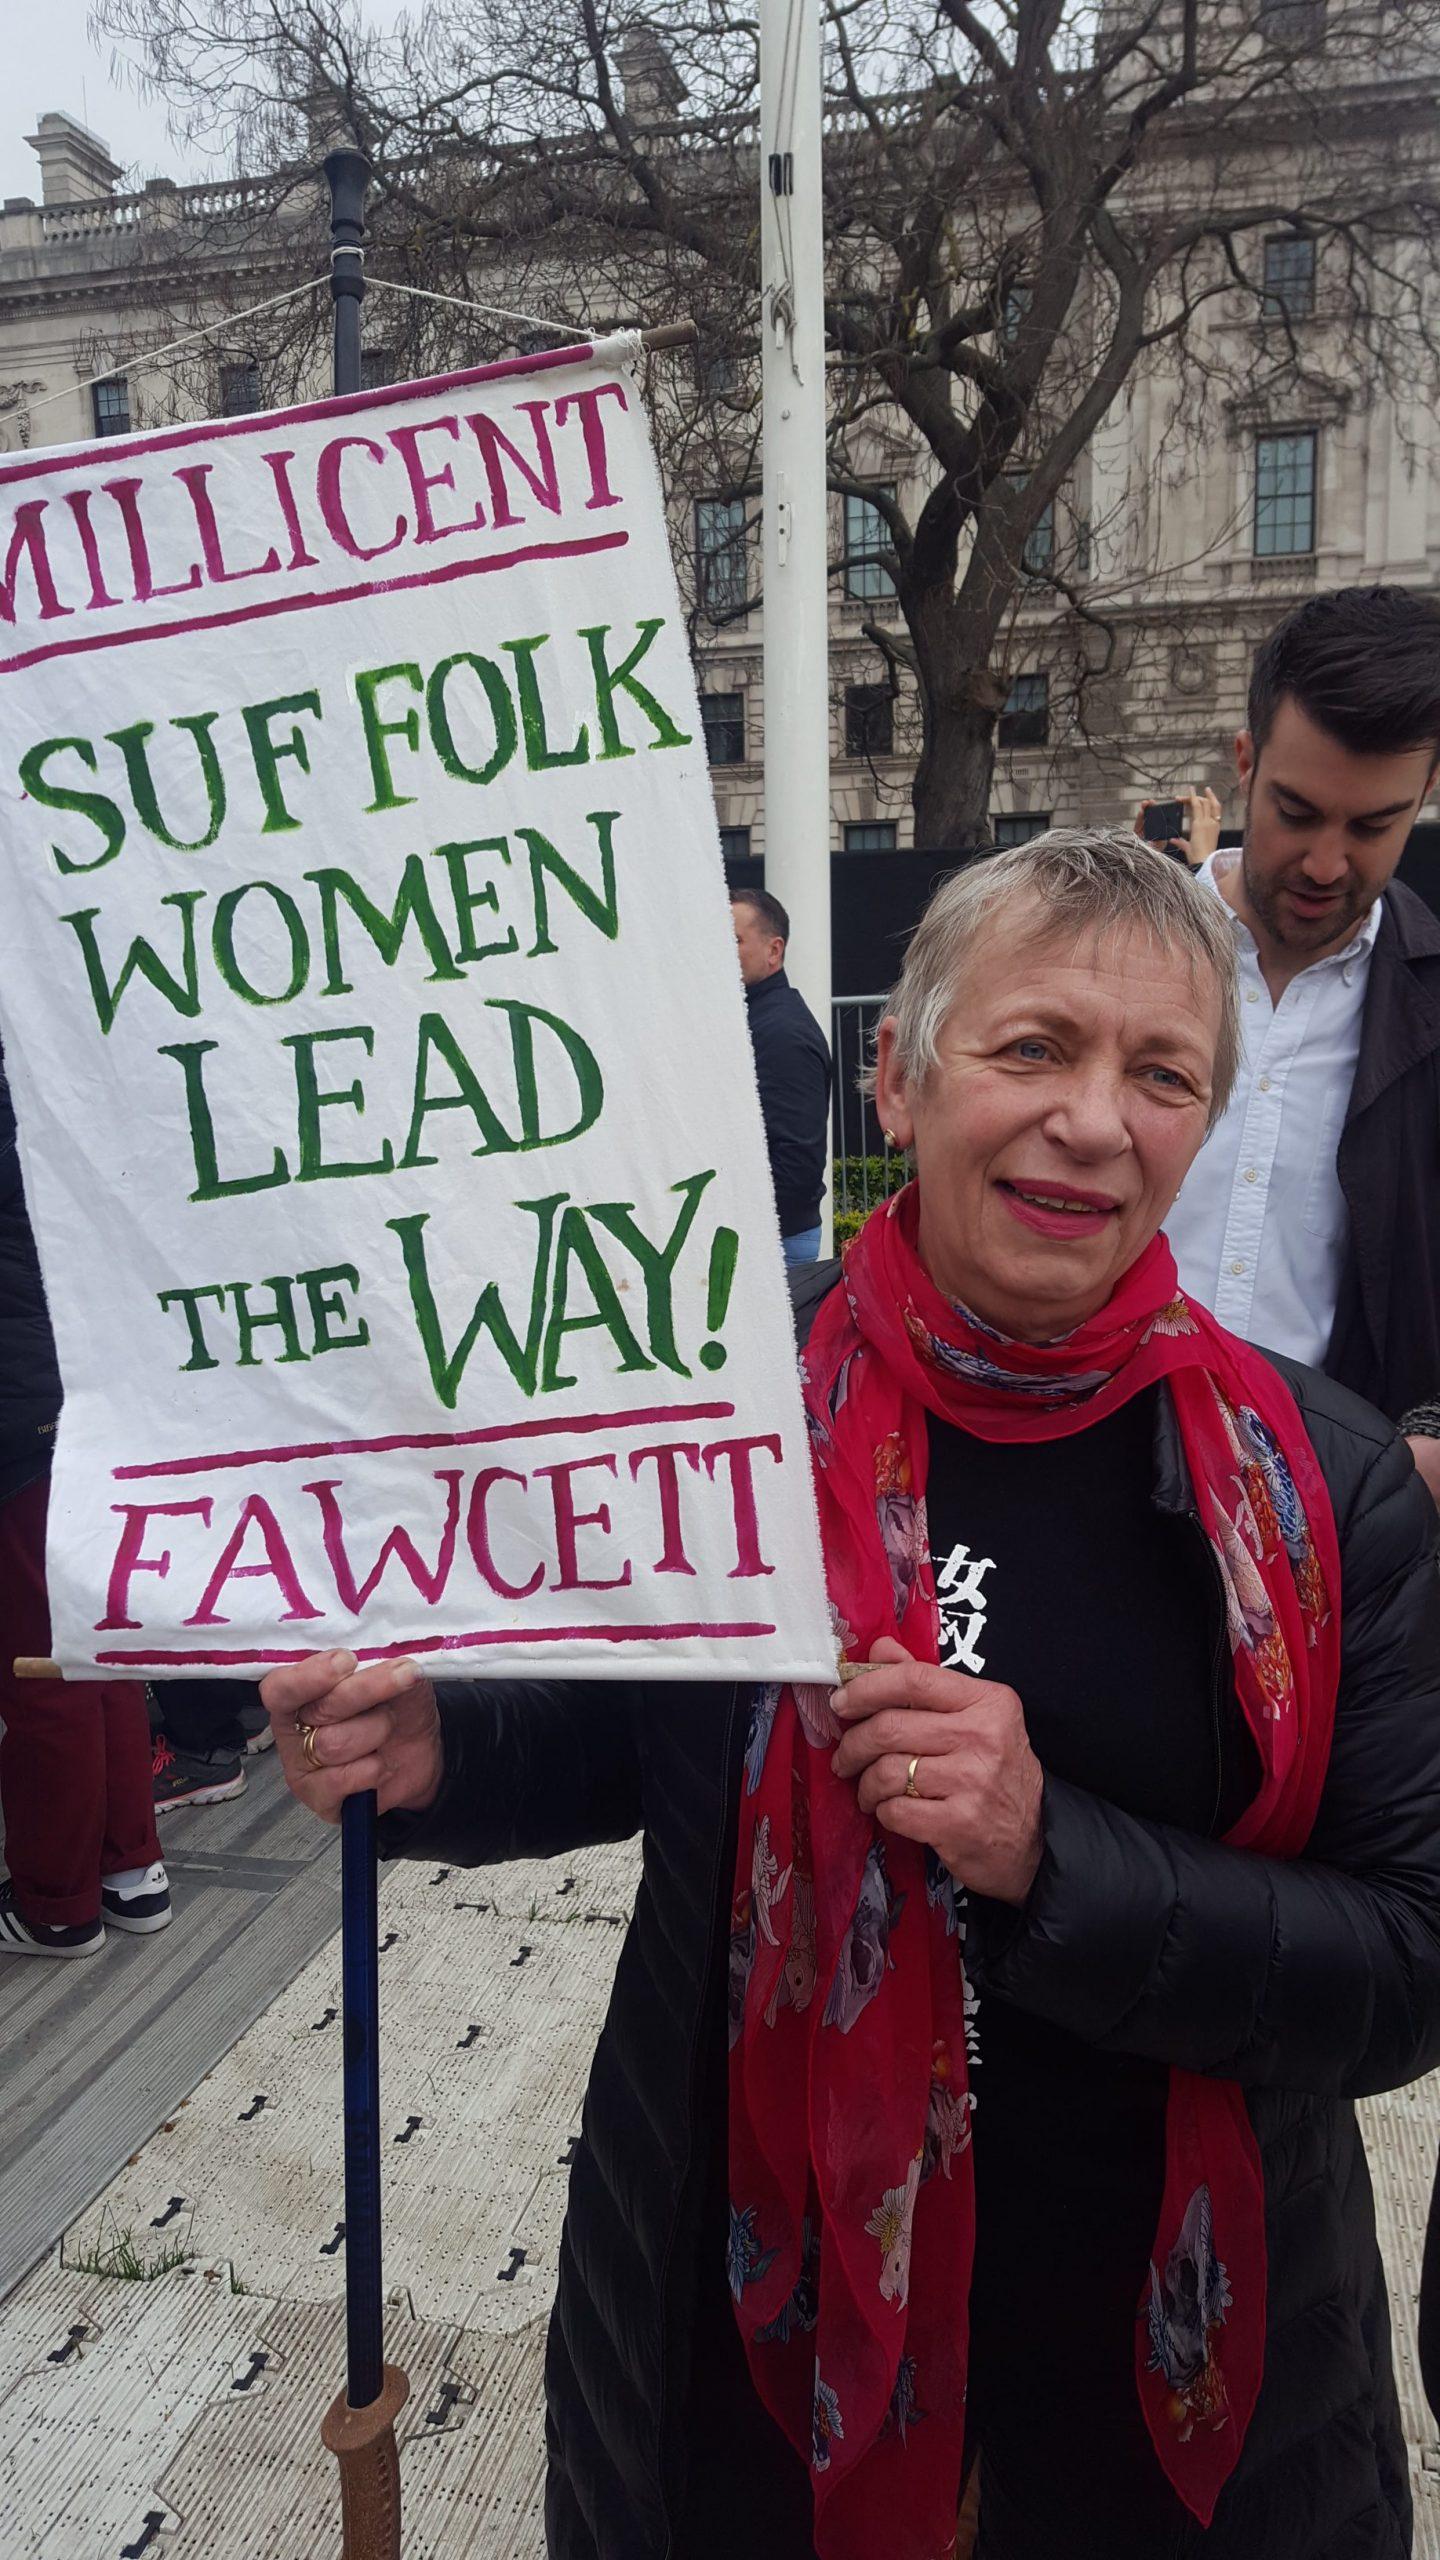 Millicent Fawcett Suffolk Women Lead the Way banner